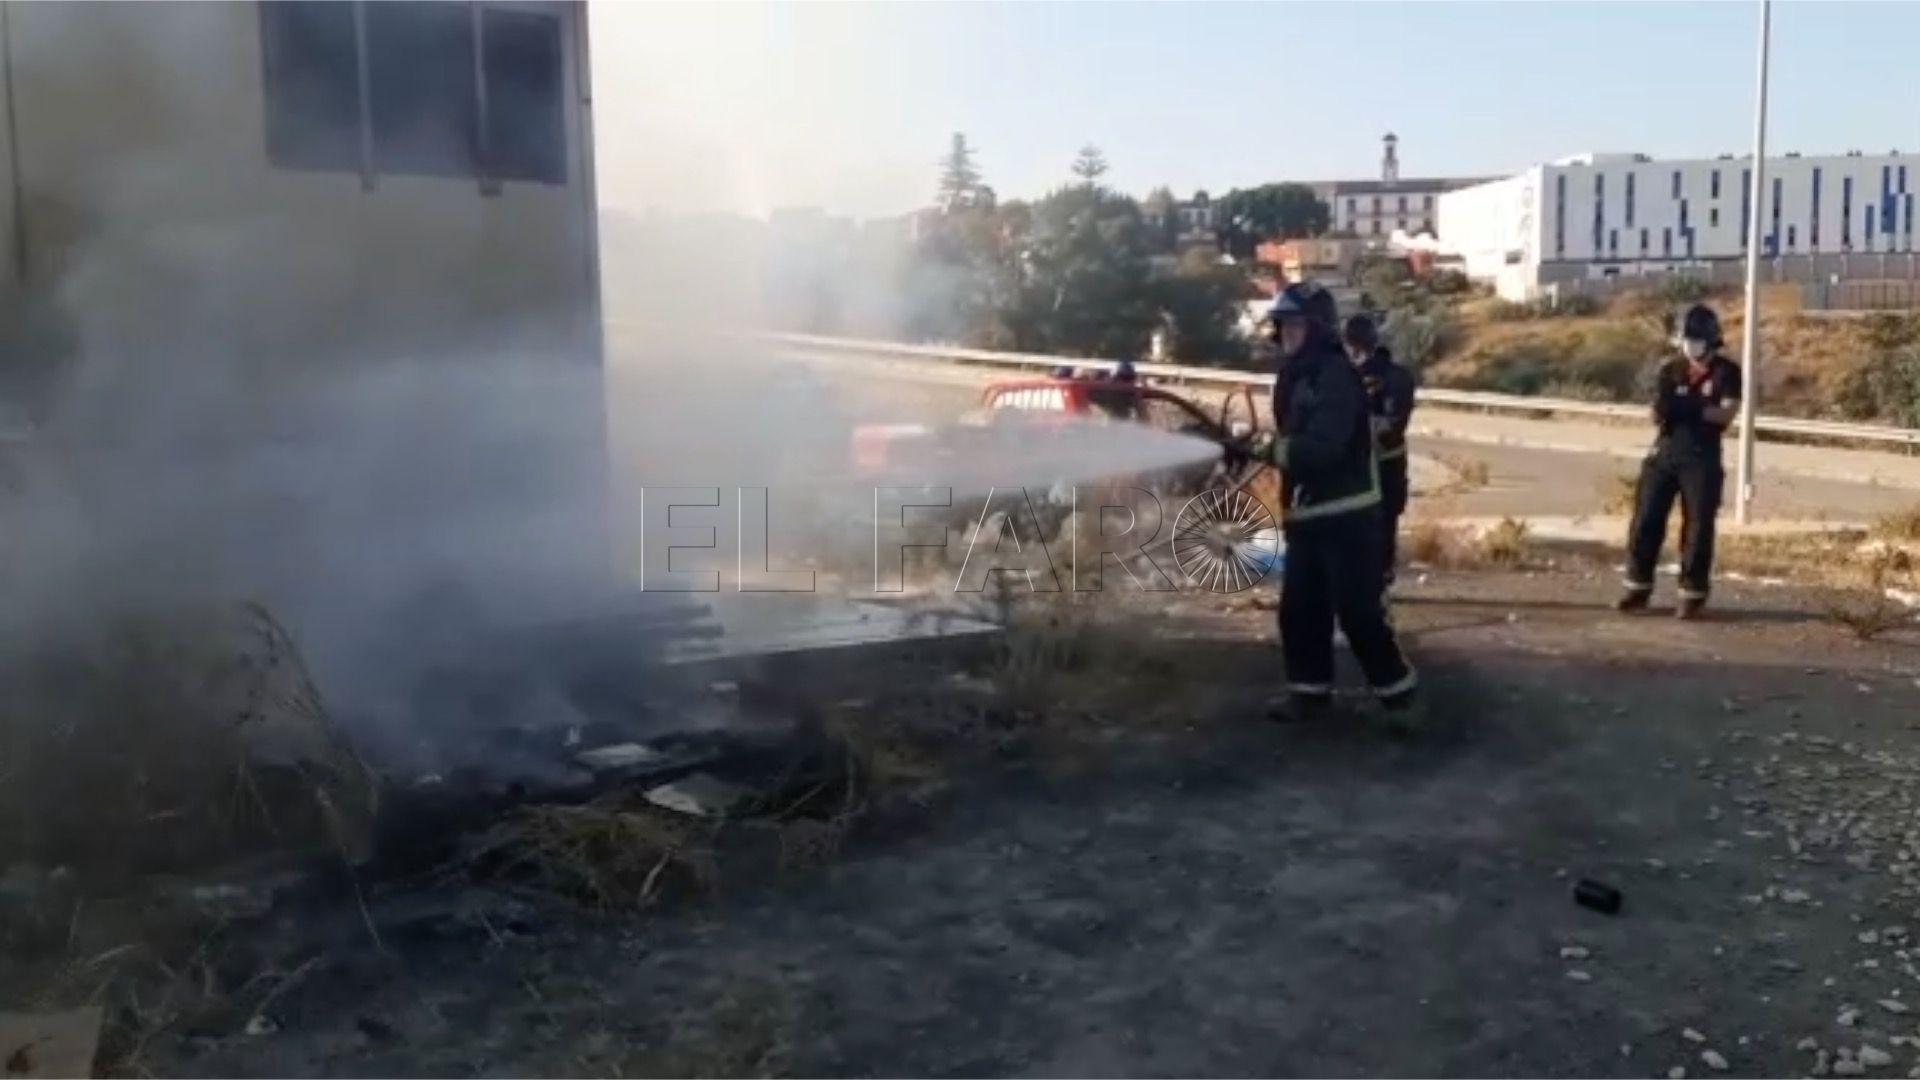 vertedero-rosales-bomberos-incendios-7